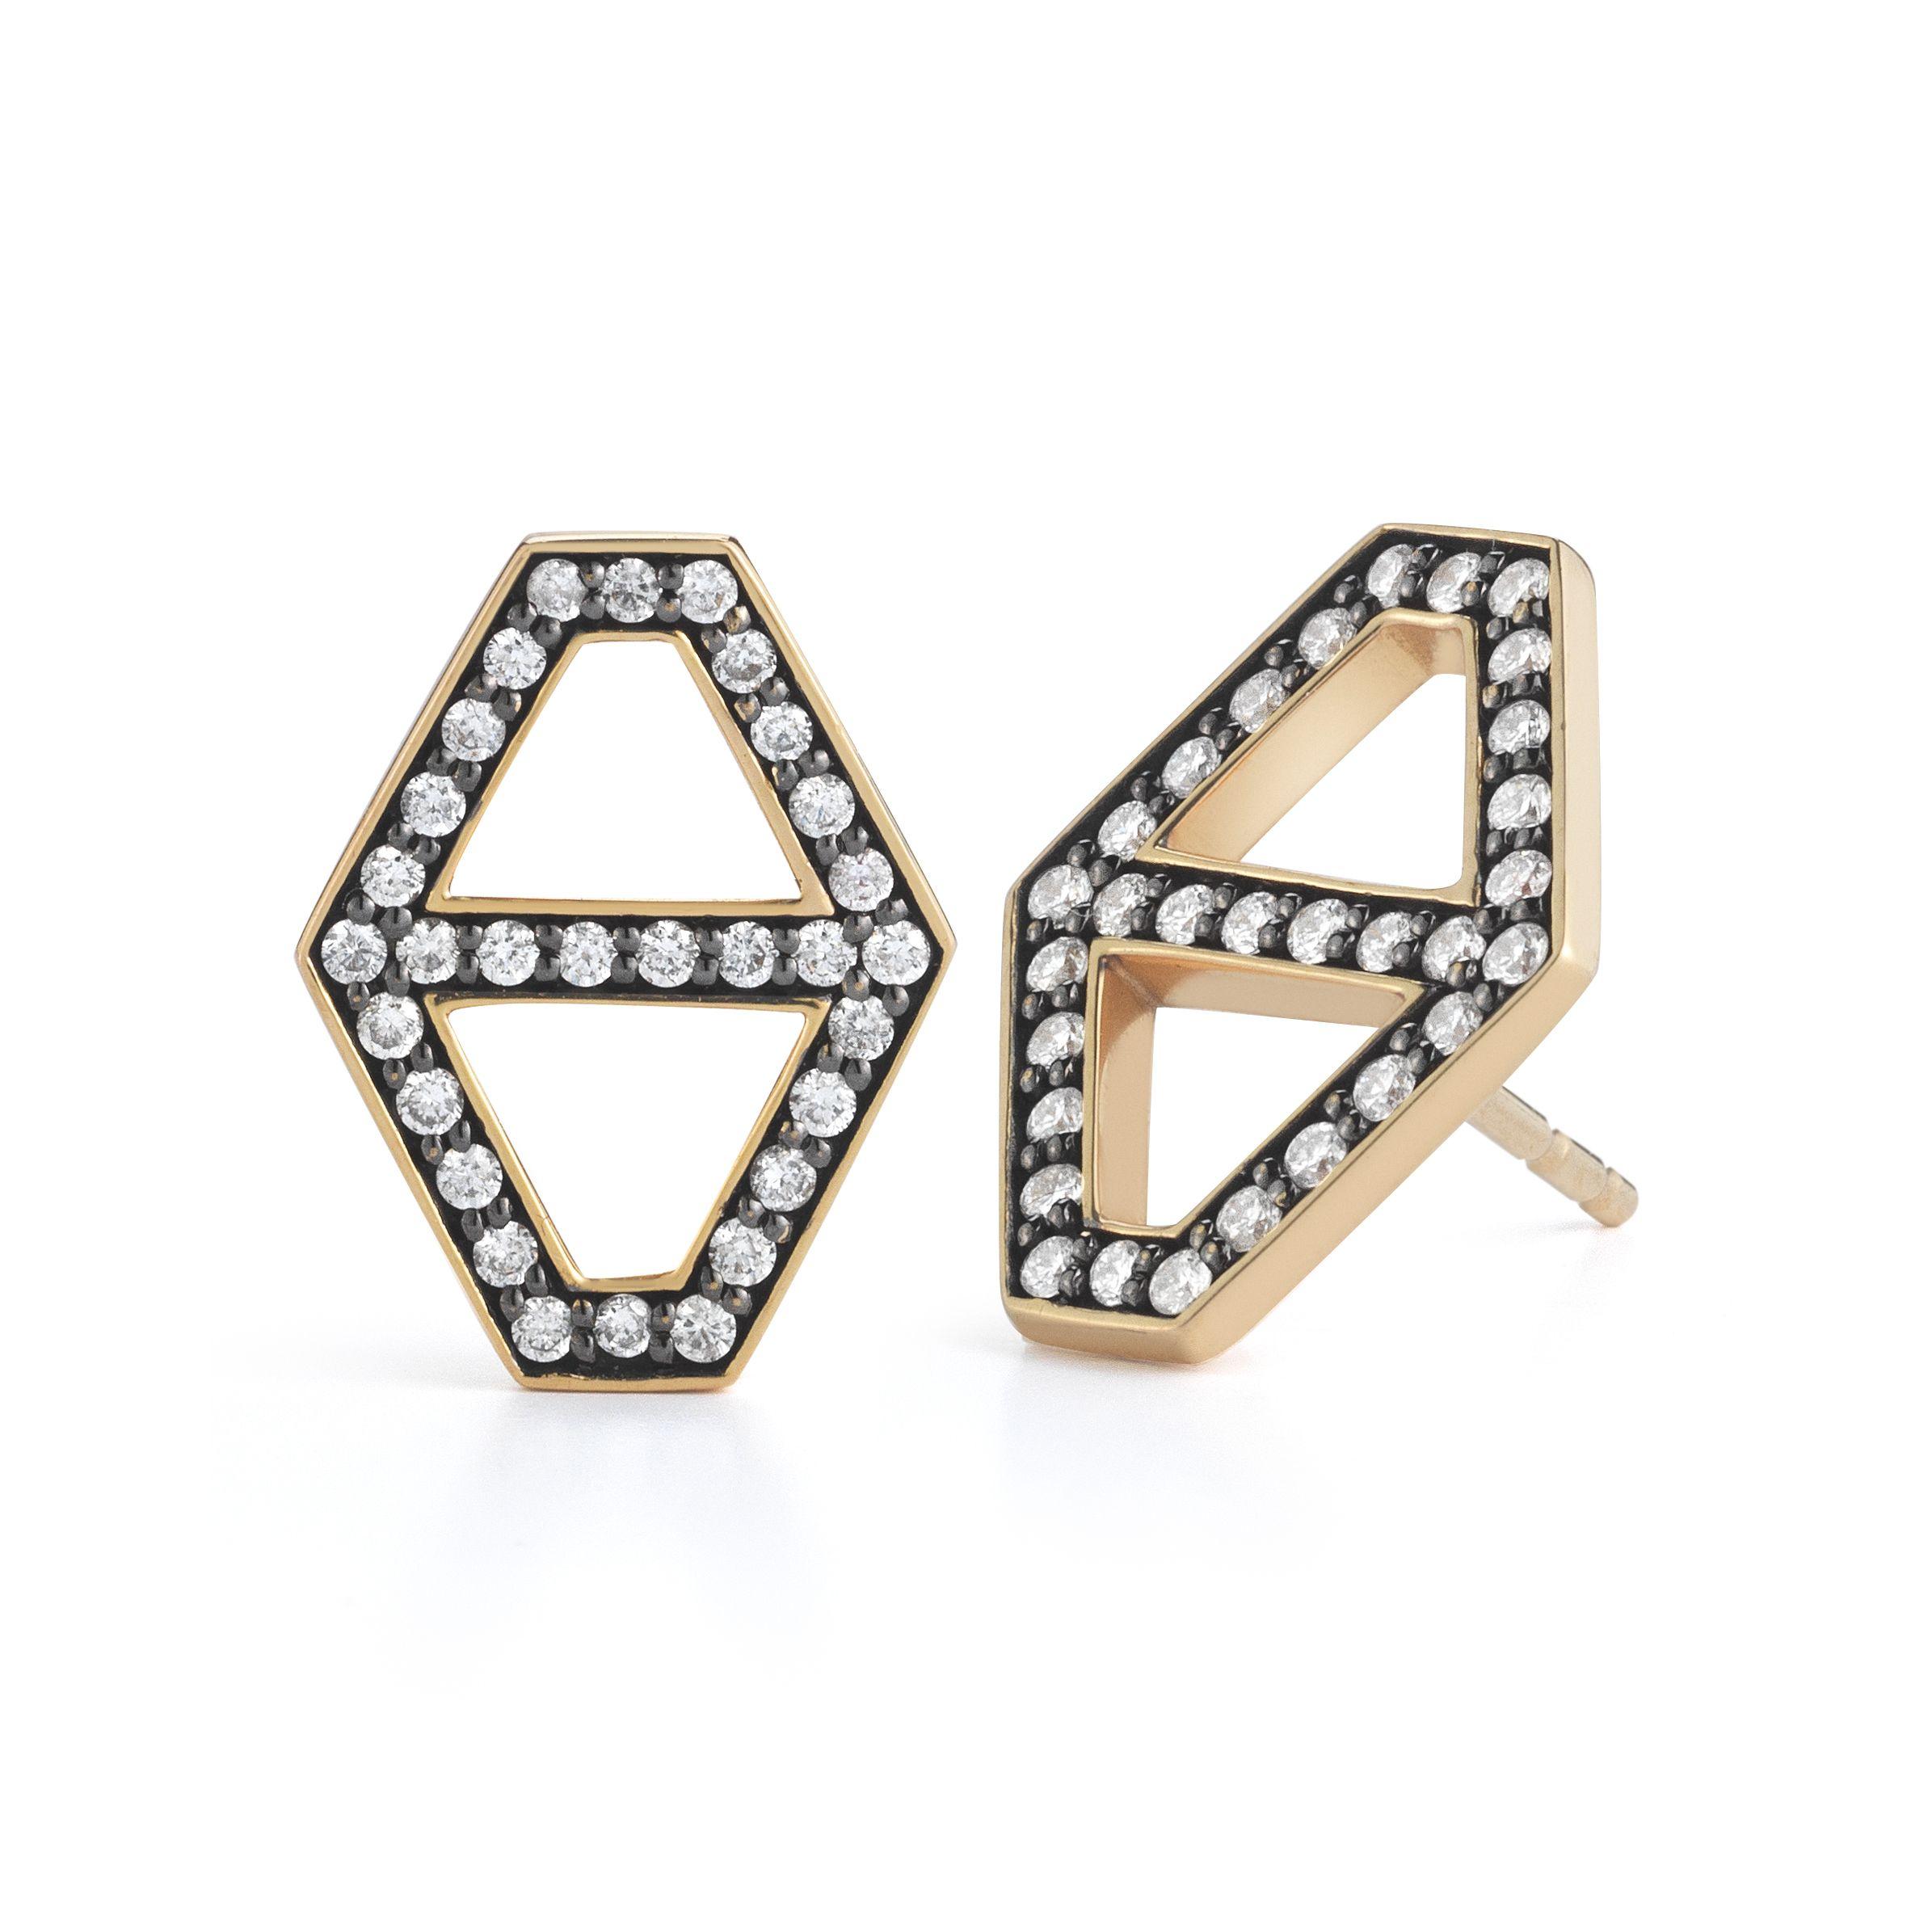 Walters Faith Keynes 18K Medium Signature Hexagon Diamond Stud Earrings Silver DaVYGcs